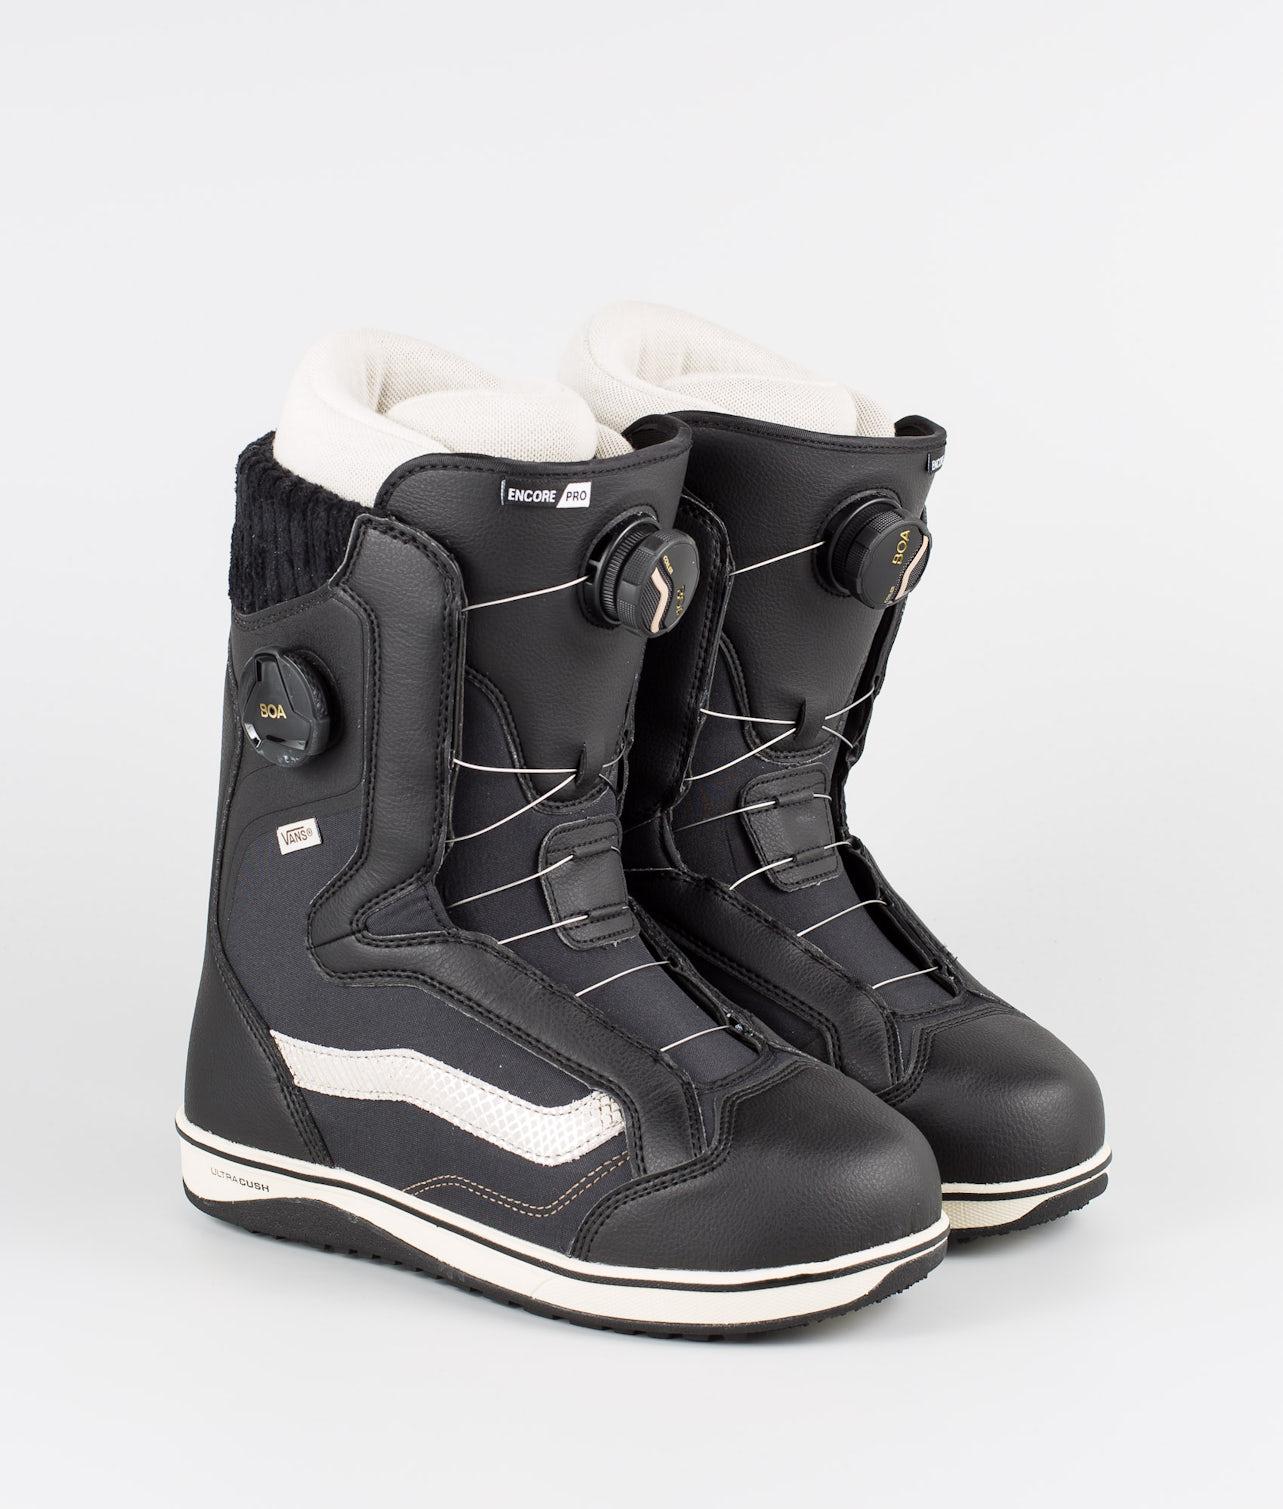 Vans Snowboarding Encore Pro Boots Black/TurtleDove